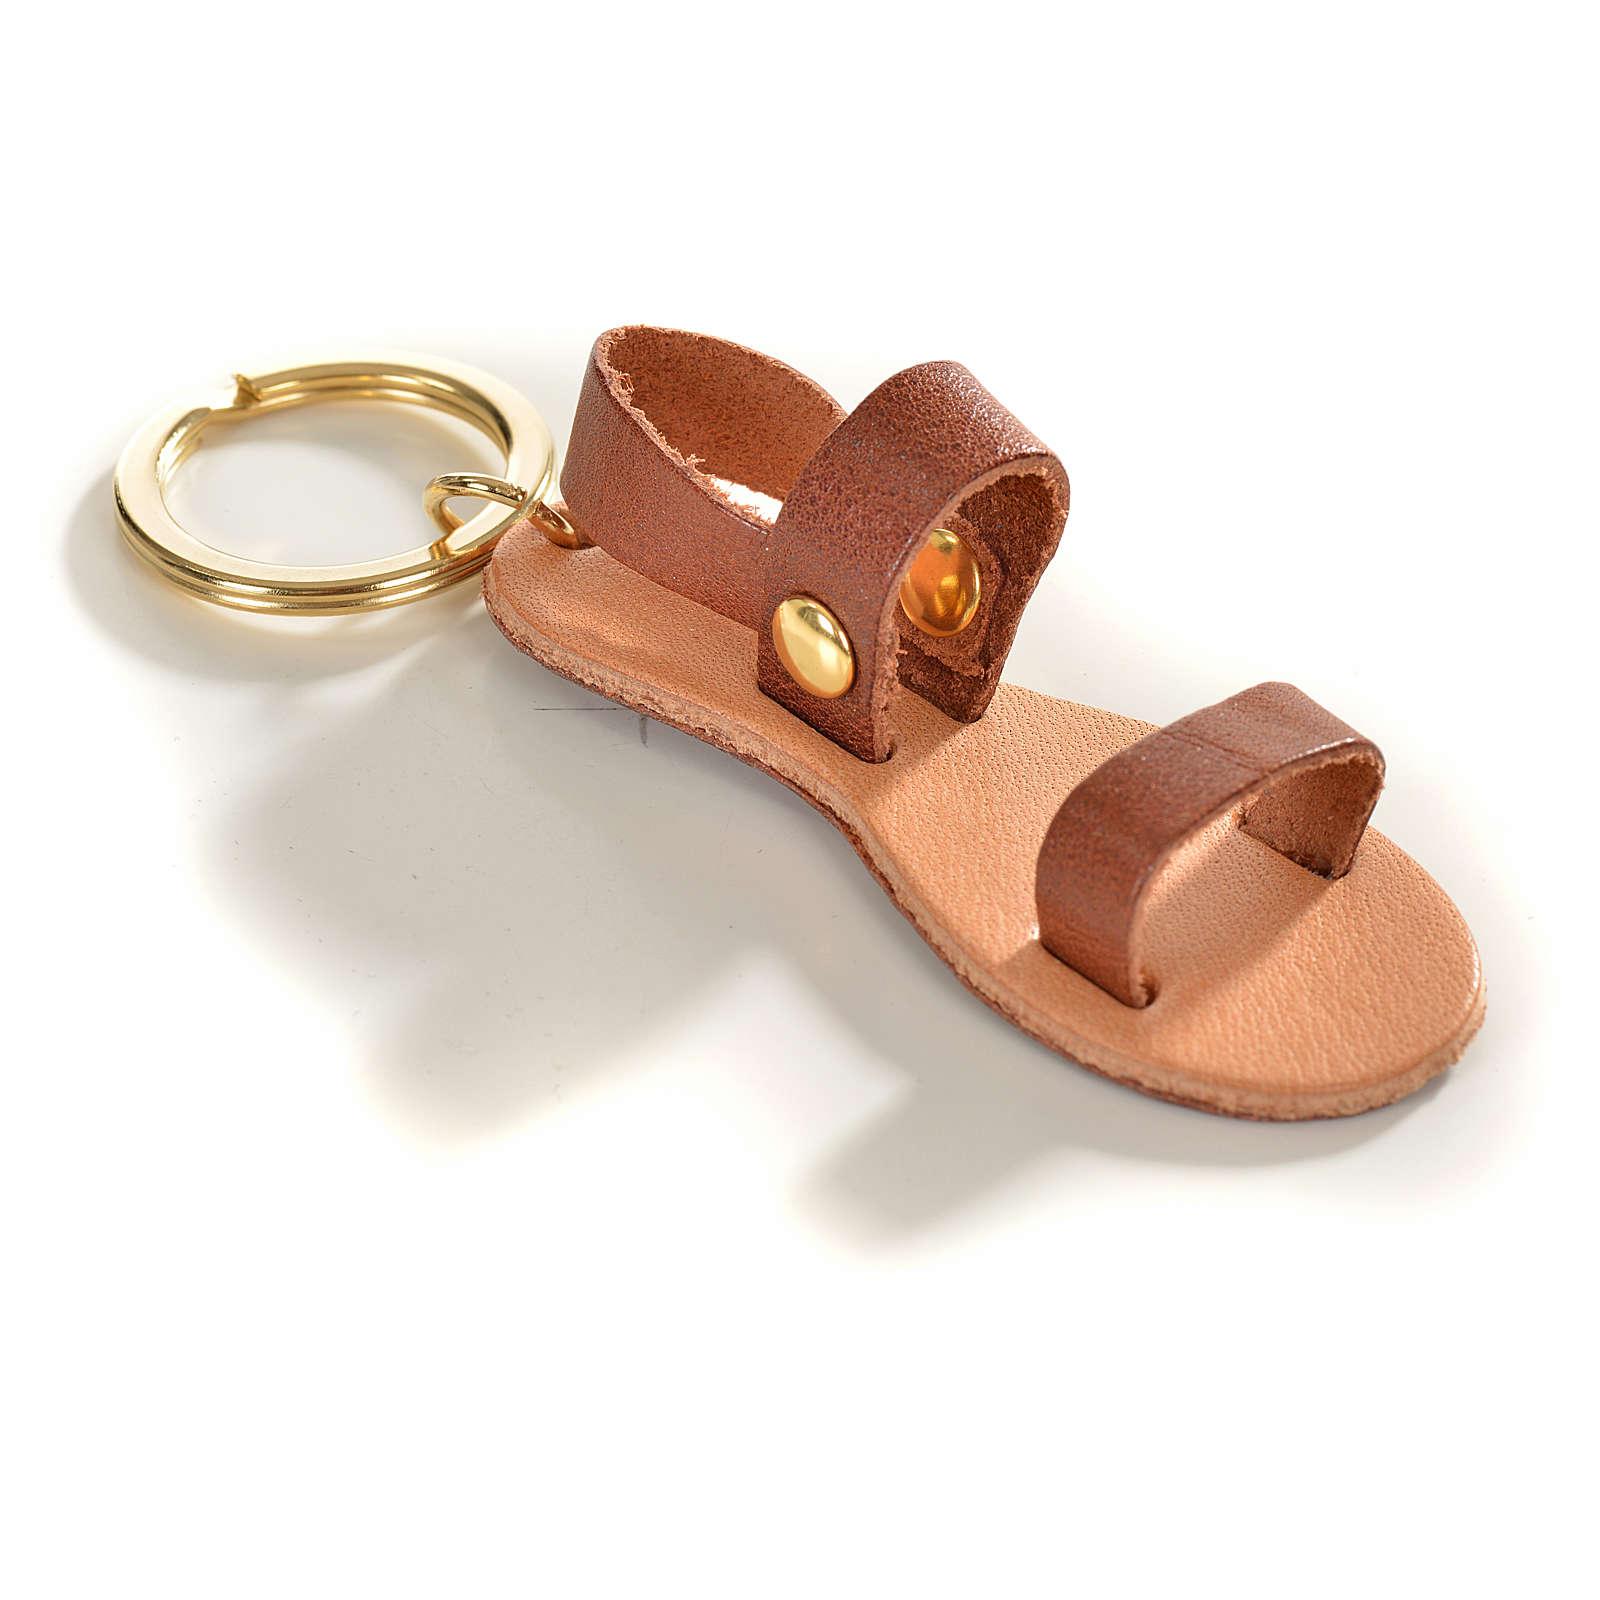 Llavero sandalia franciscana cuero verdadero 3